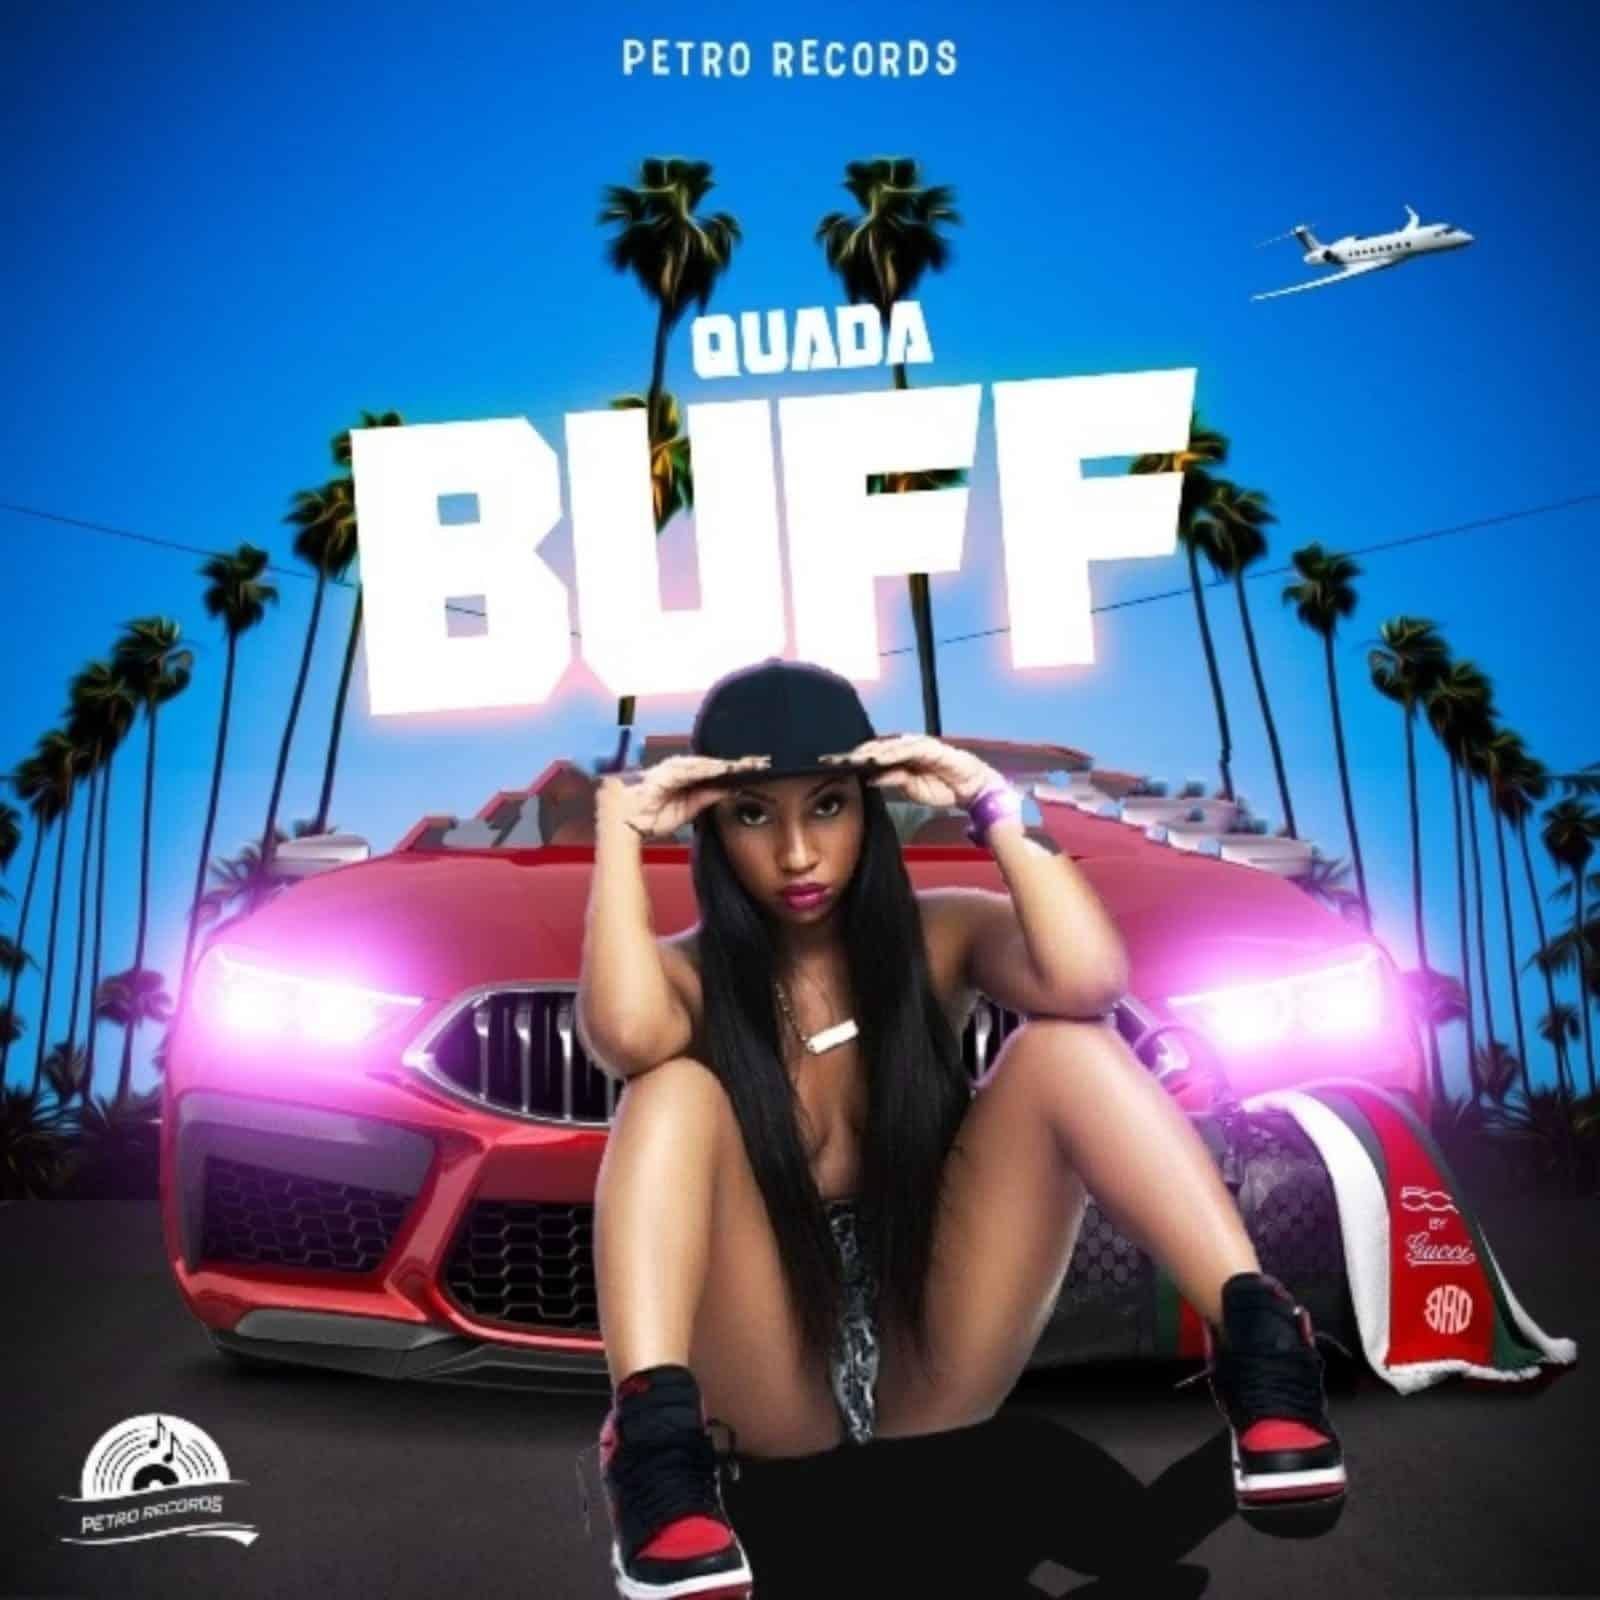 Quada - Buff - Petro Records